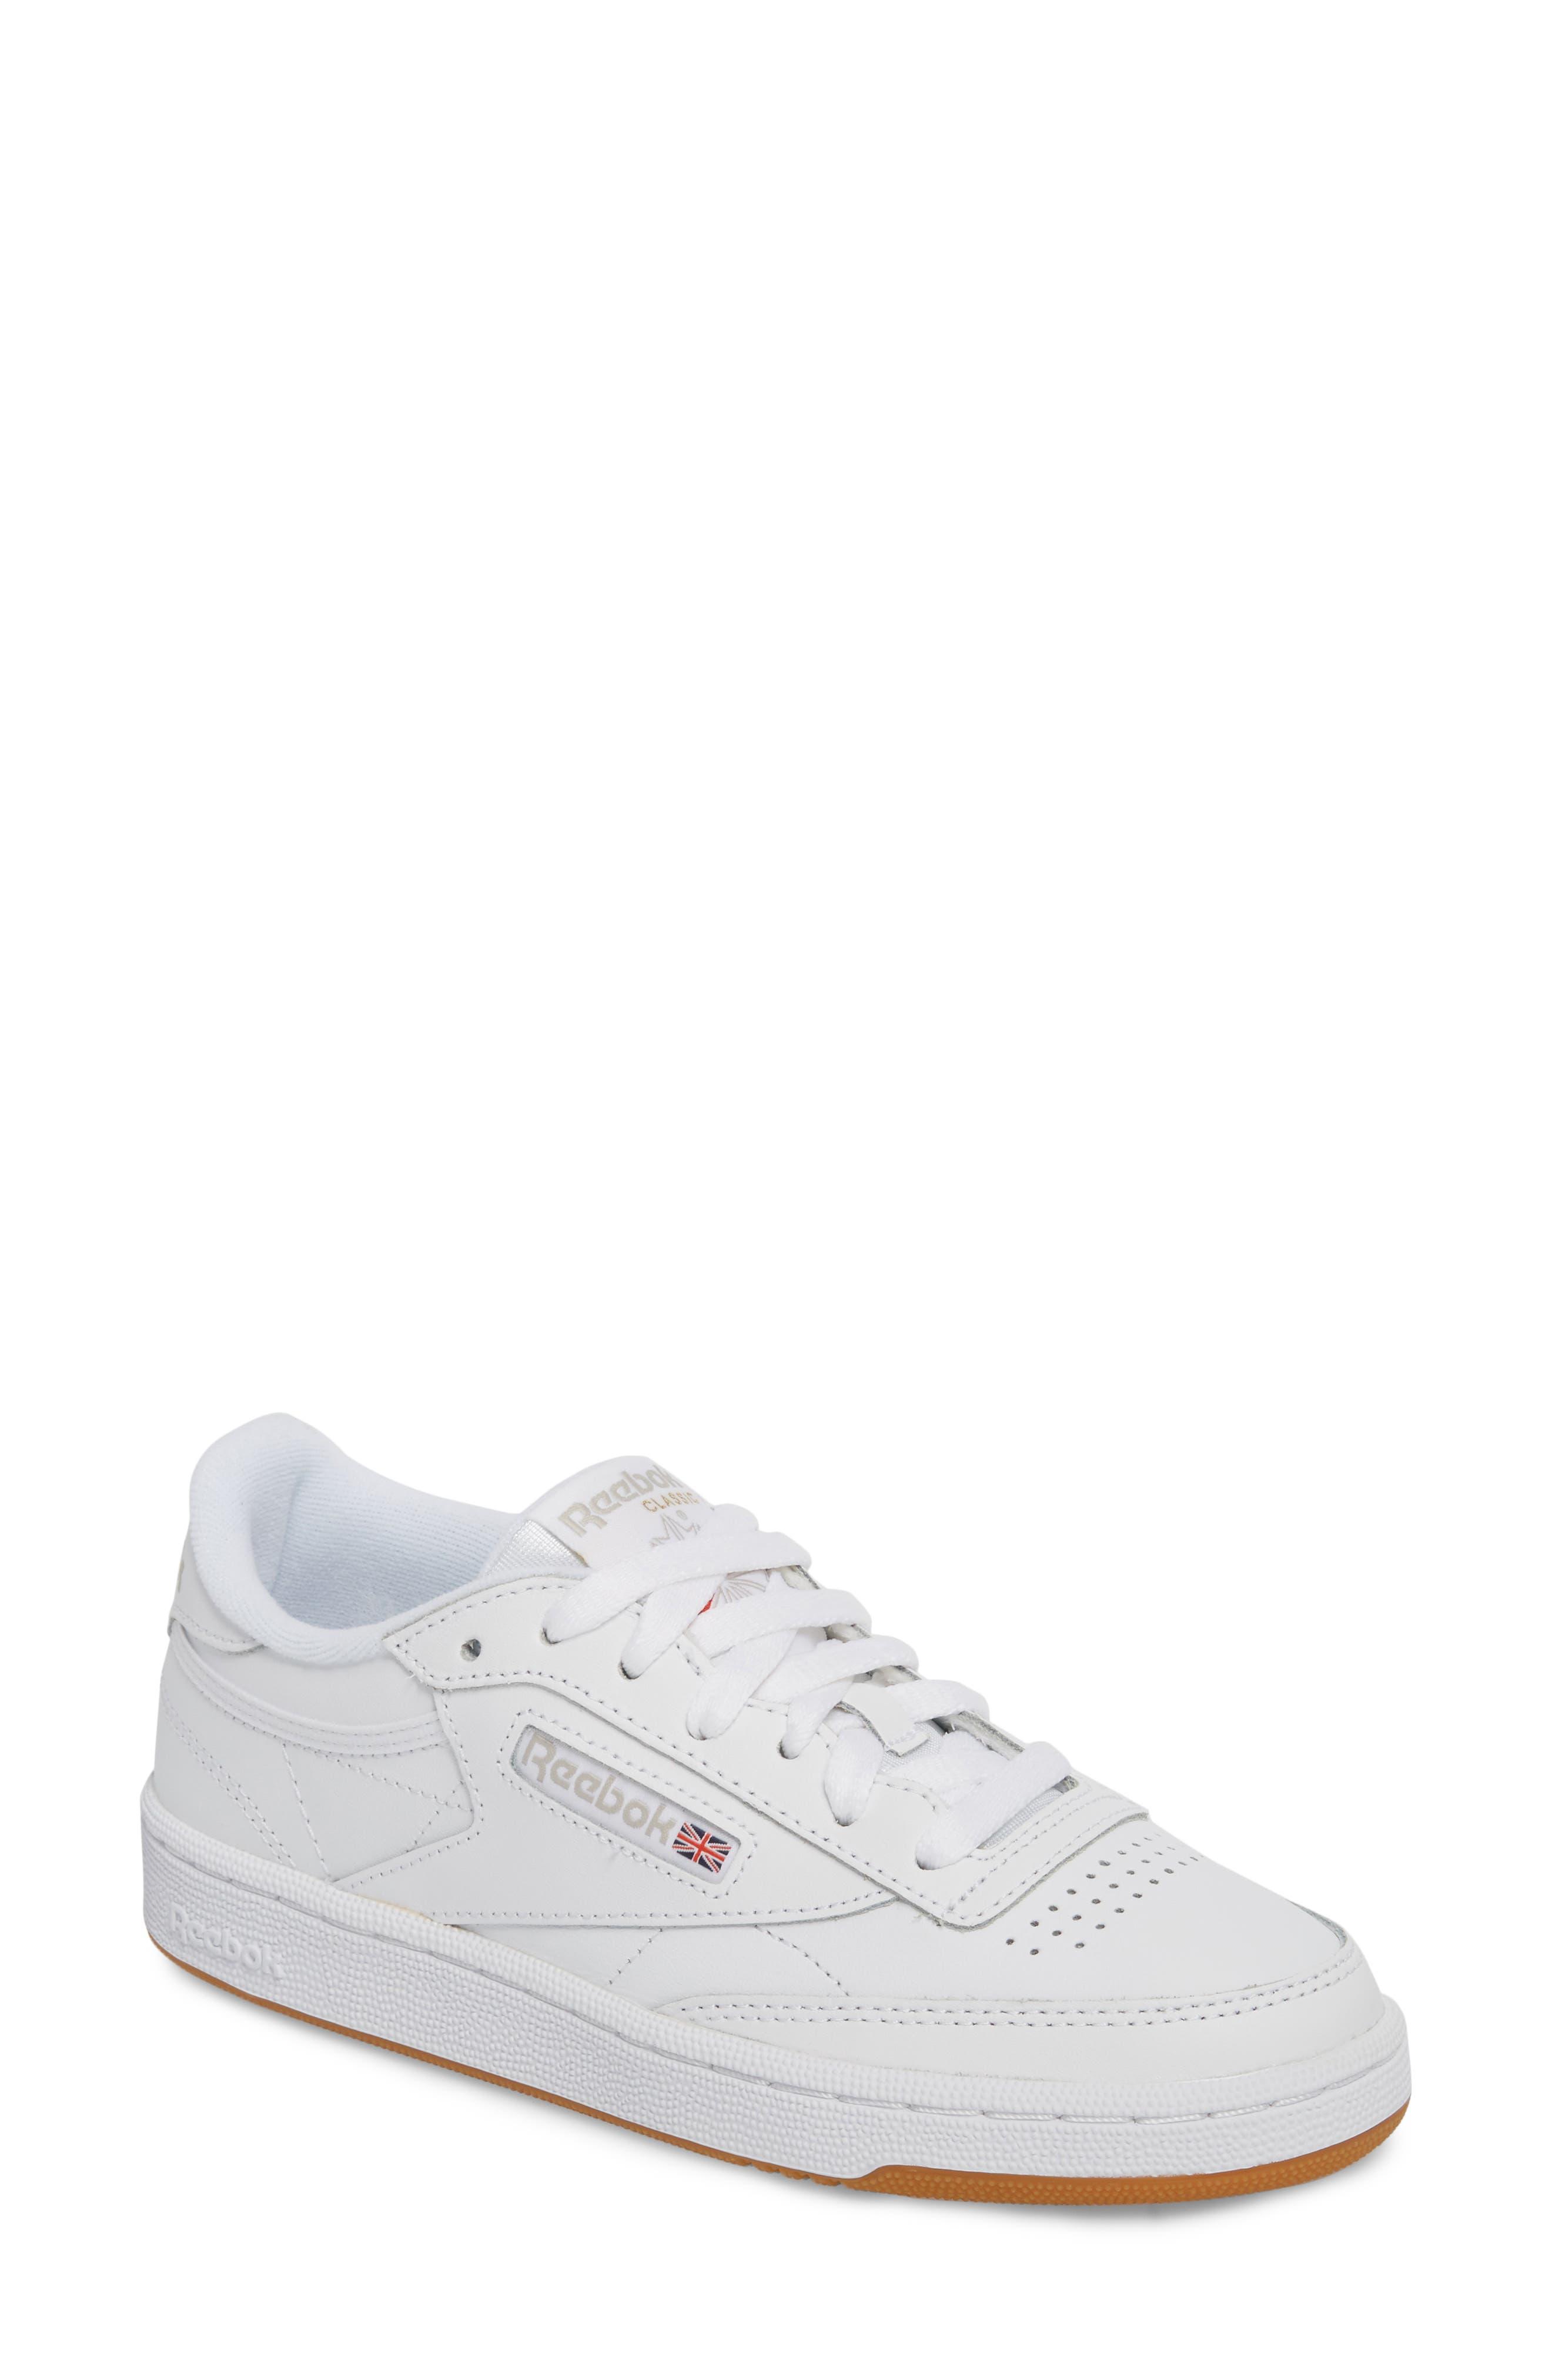 ,                             Club C 85 Sneaker,                             Main thumbnail 1, color,                             WHITE/ LIGHT GREY/ GUM